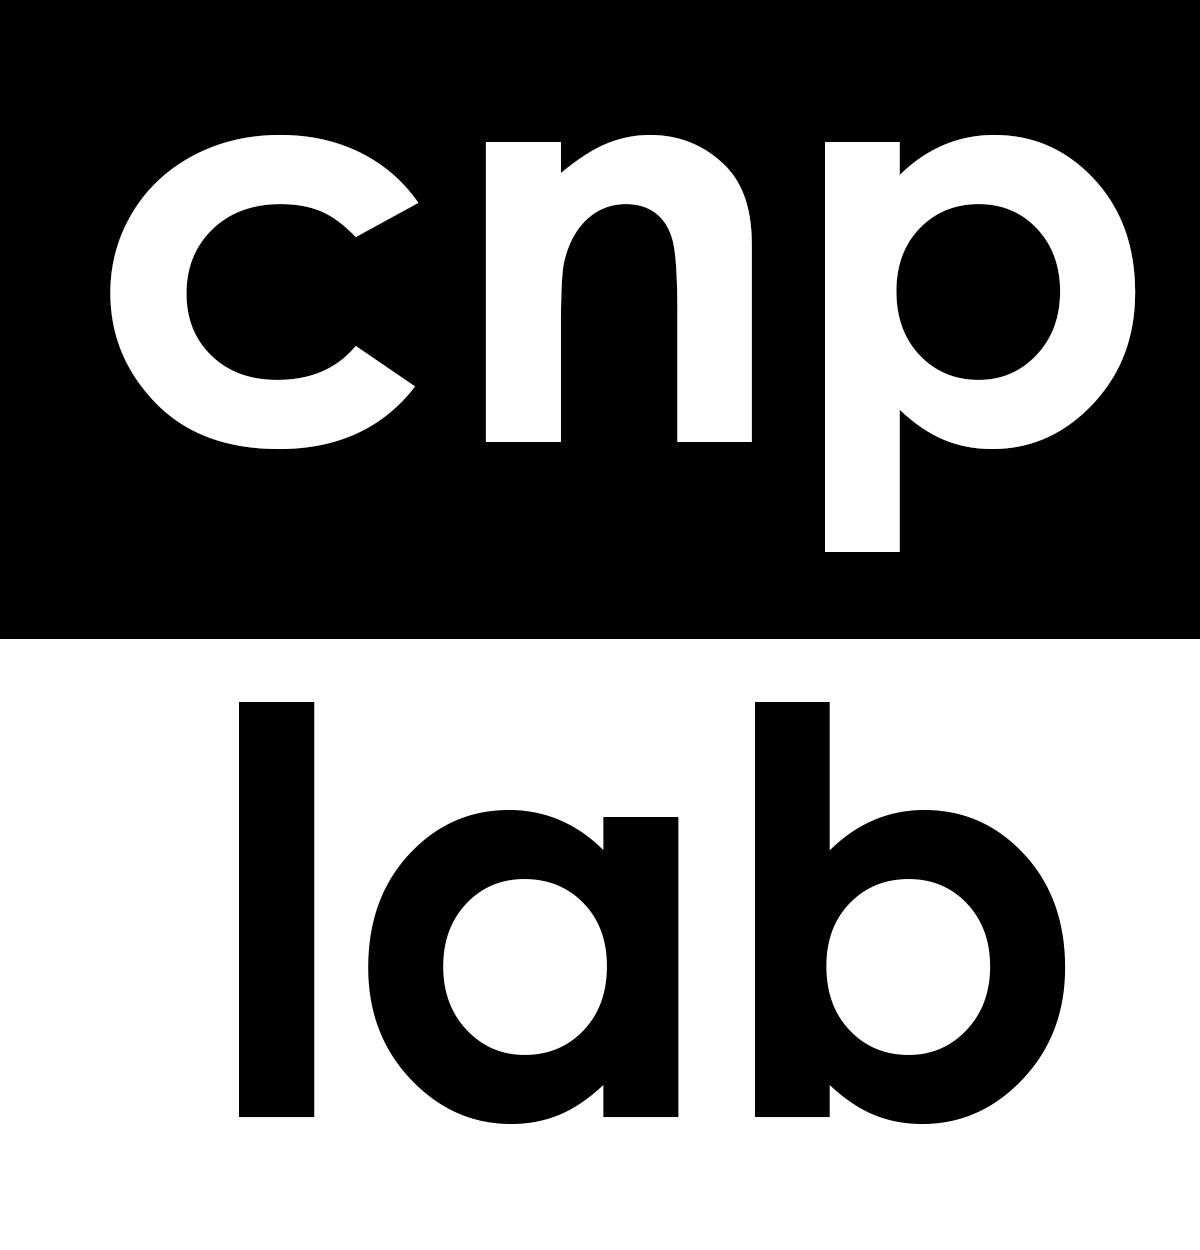 cnplab.png